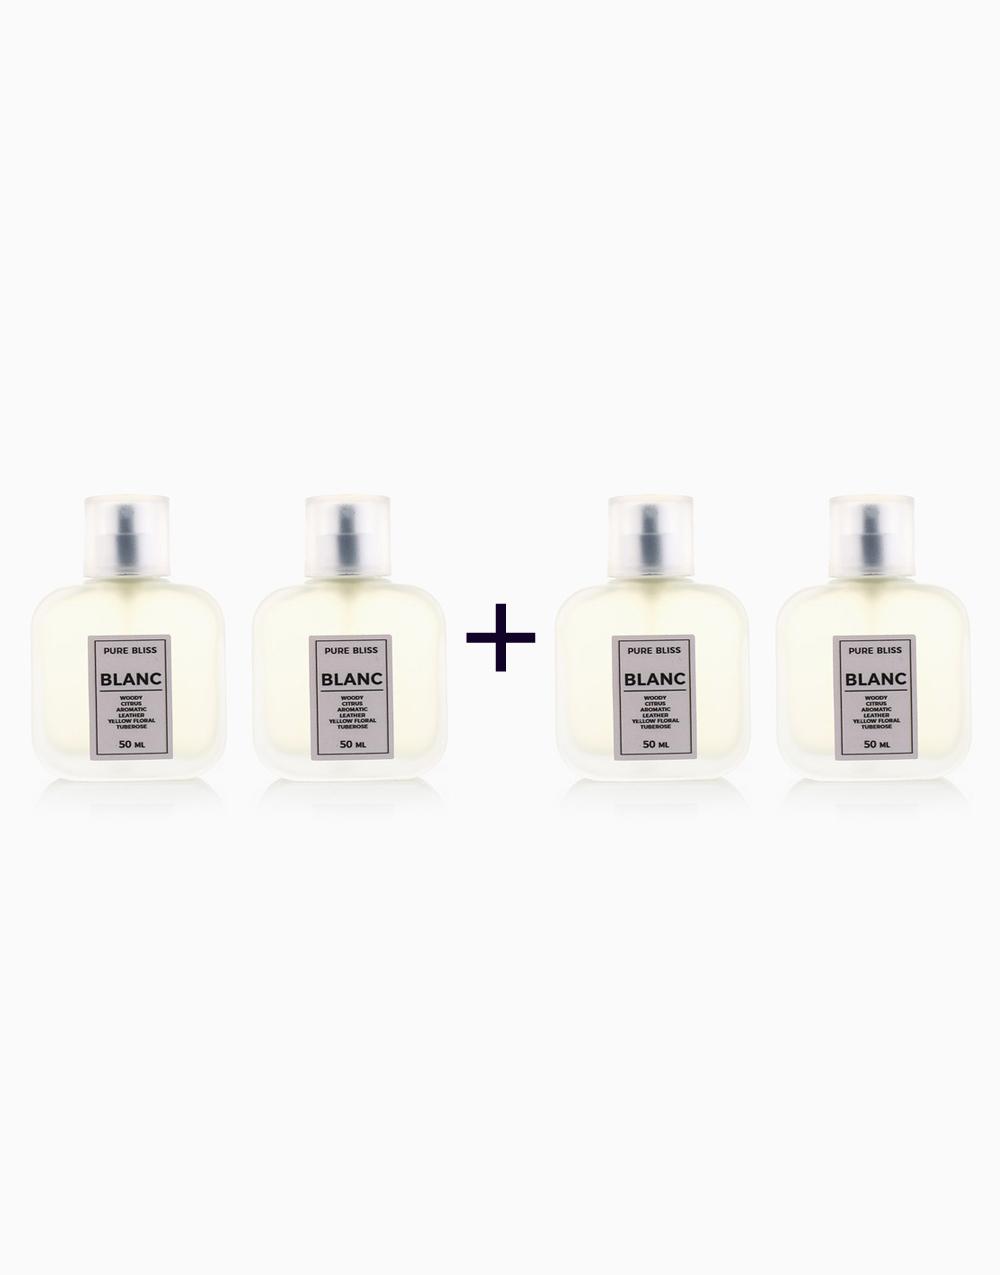 Blanc Eau de Parfum (50ml) (Buy 2, Take 2) by Pure Bliss